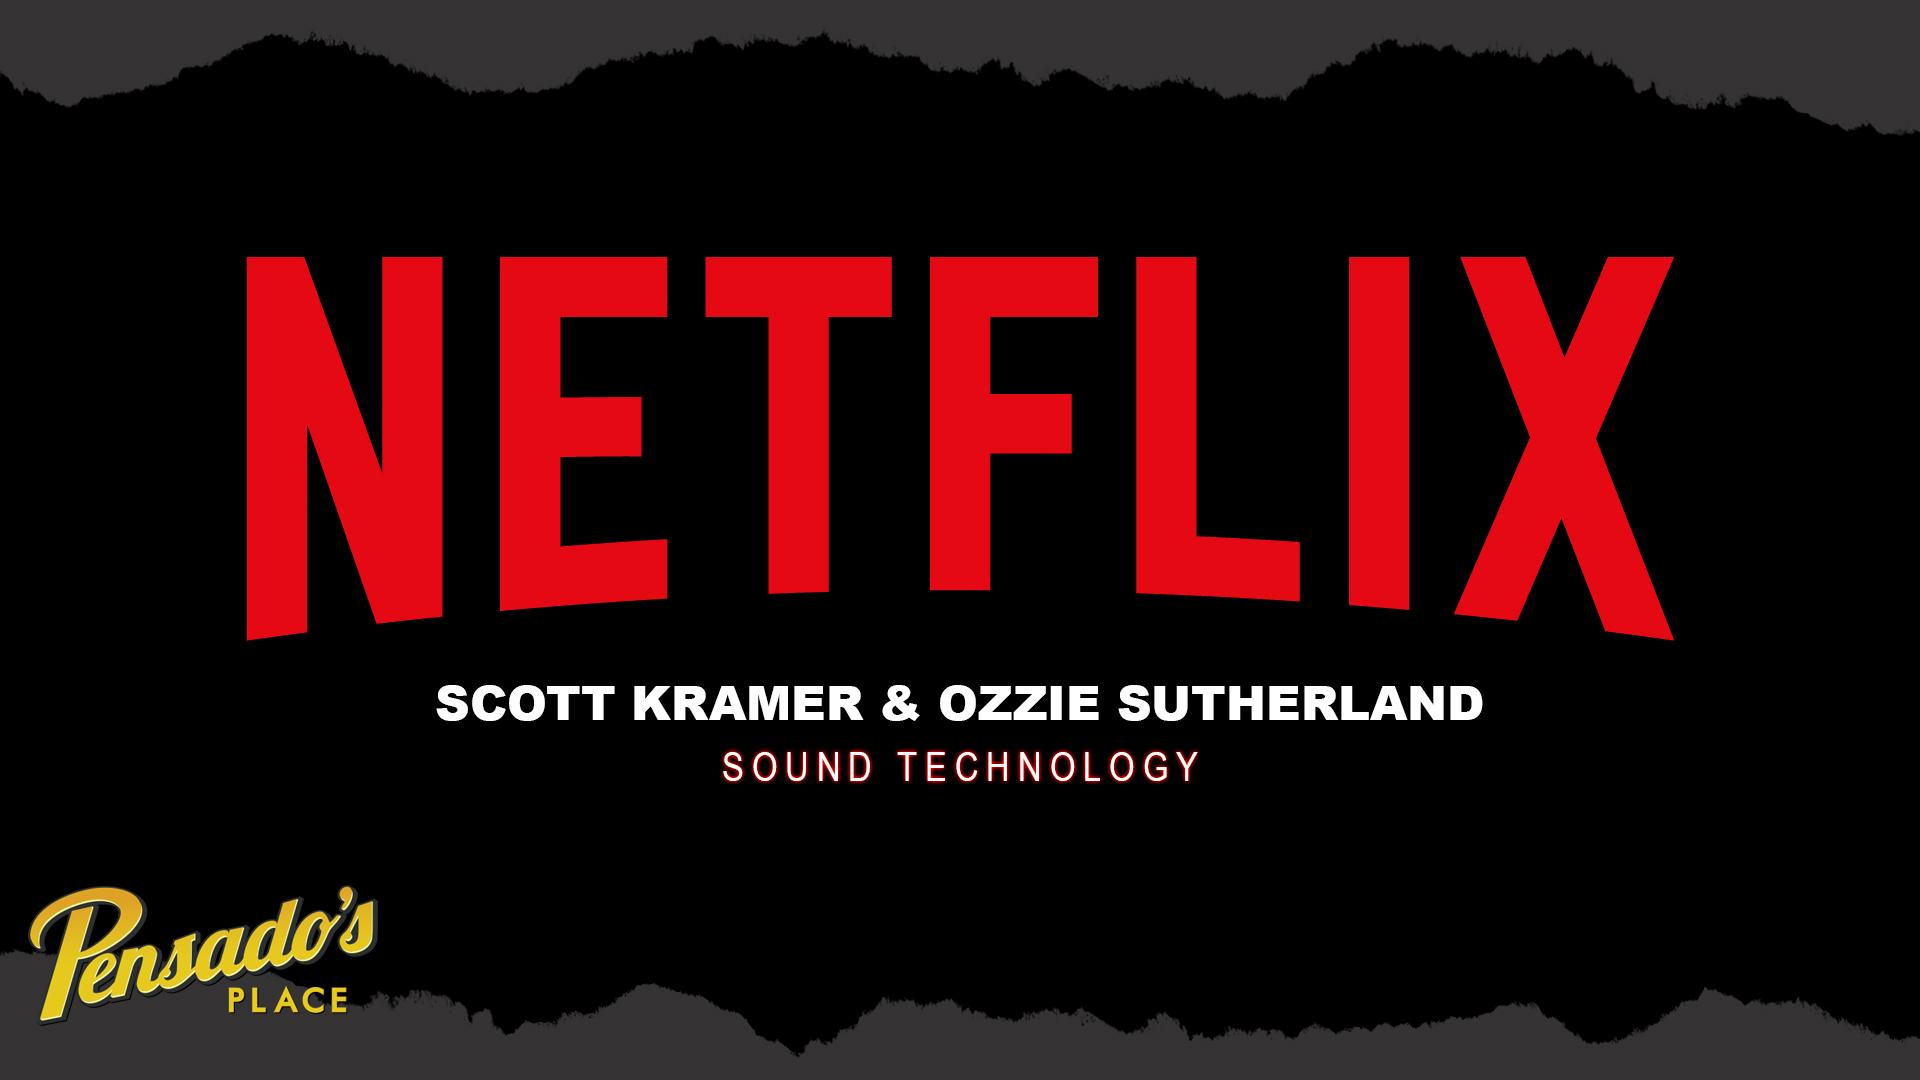 Netflix Creative Technologies & Infrastructures Sound Technology Team